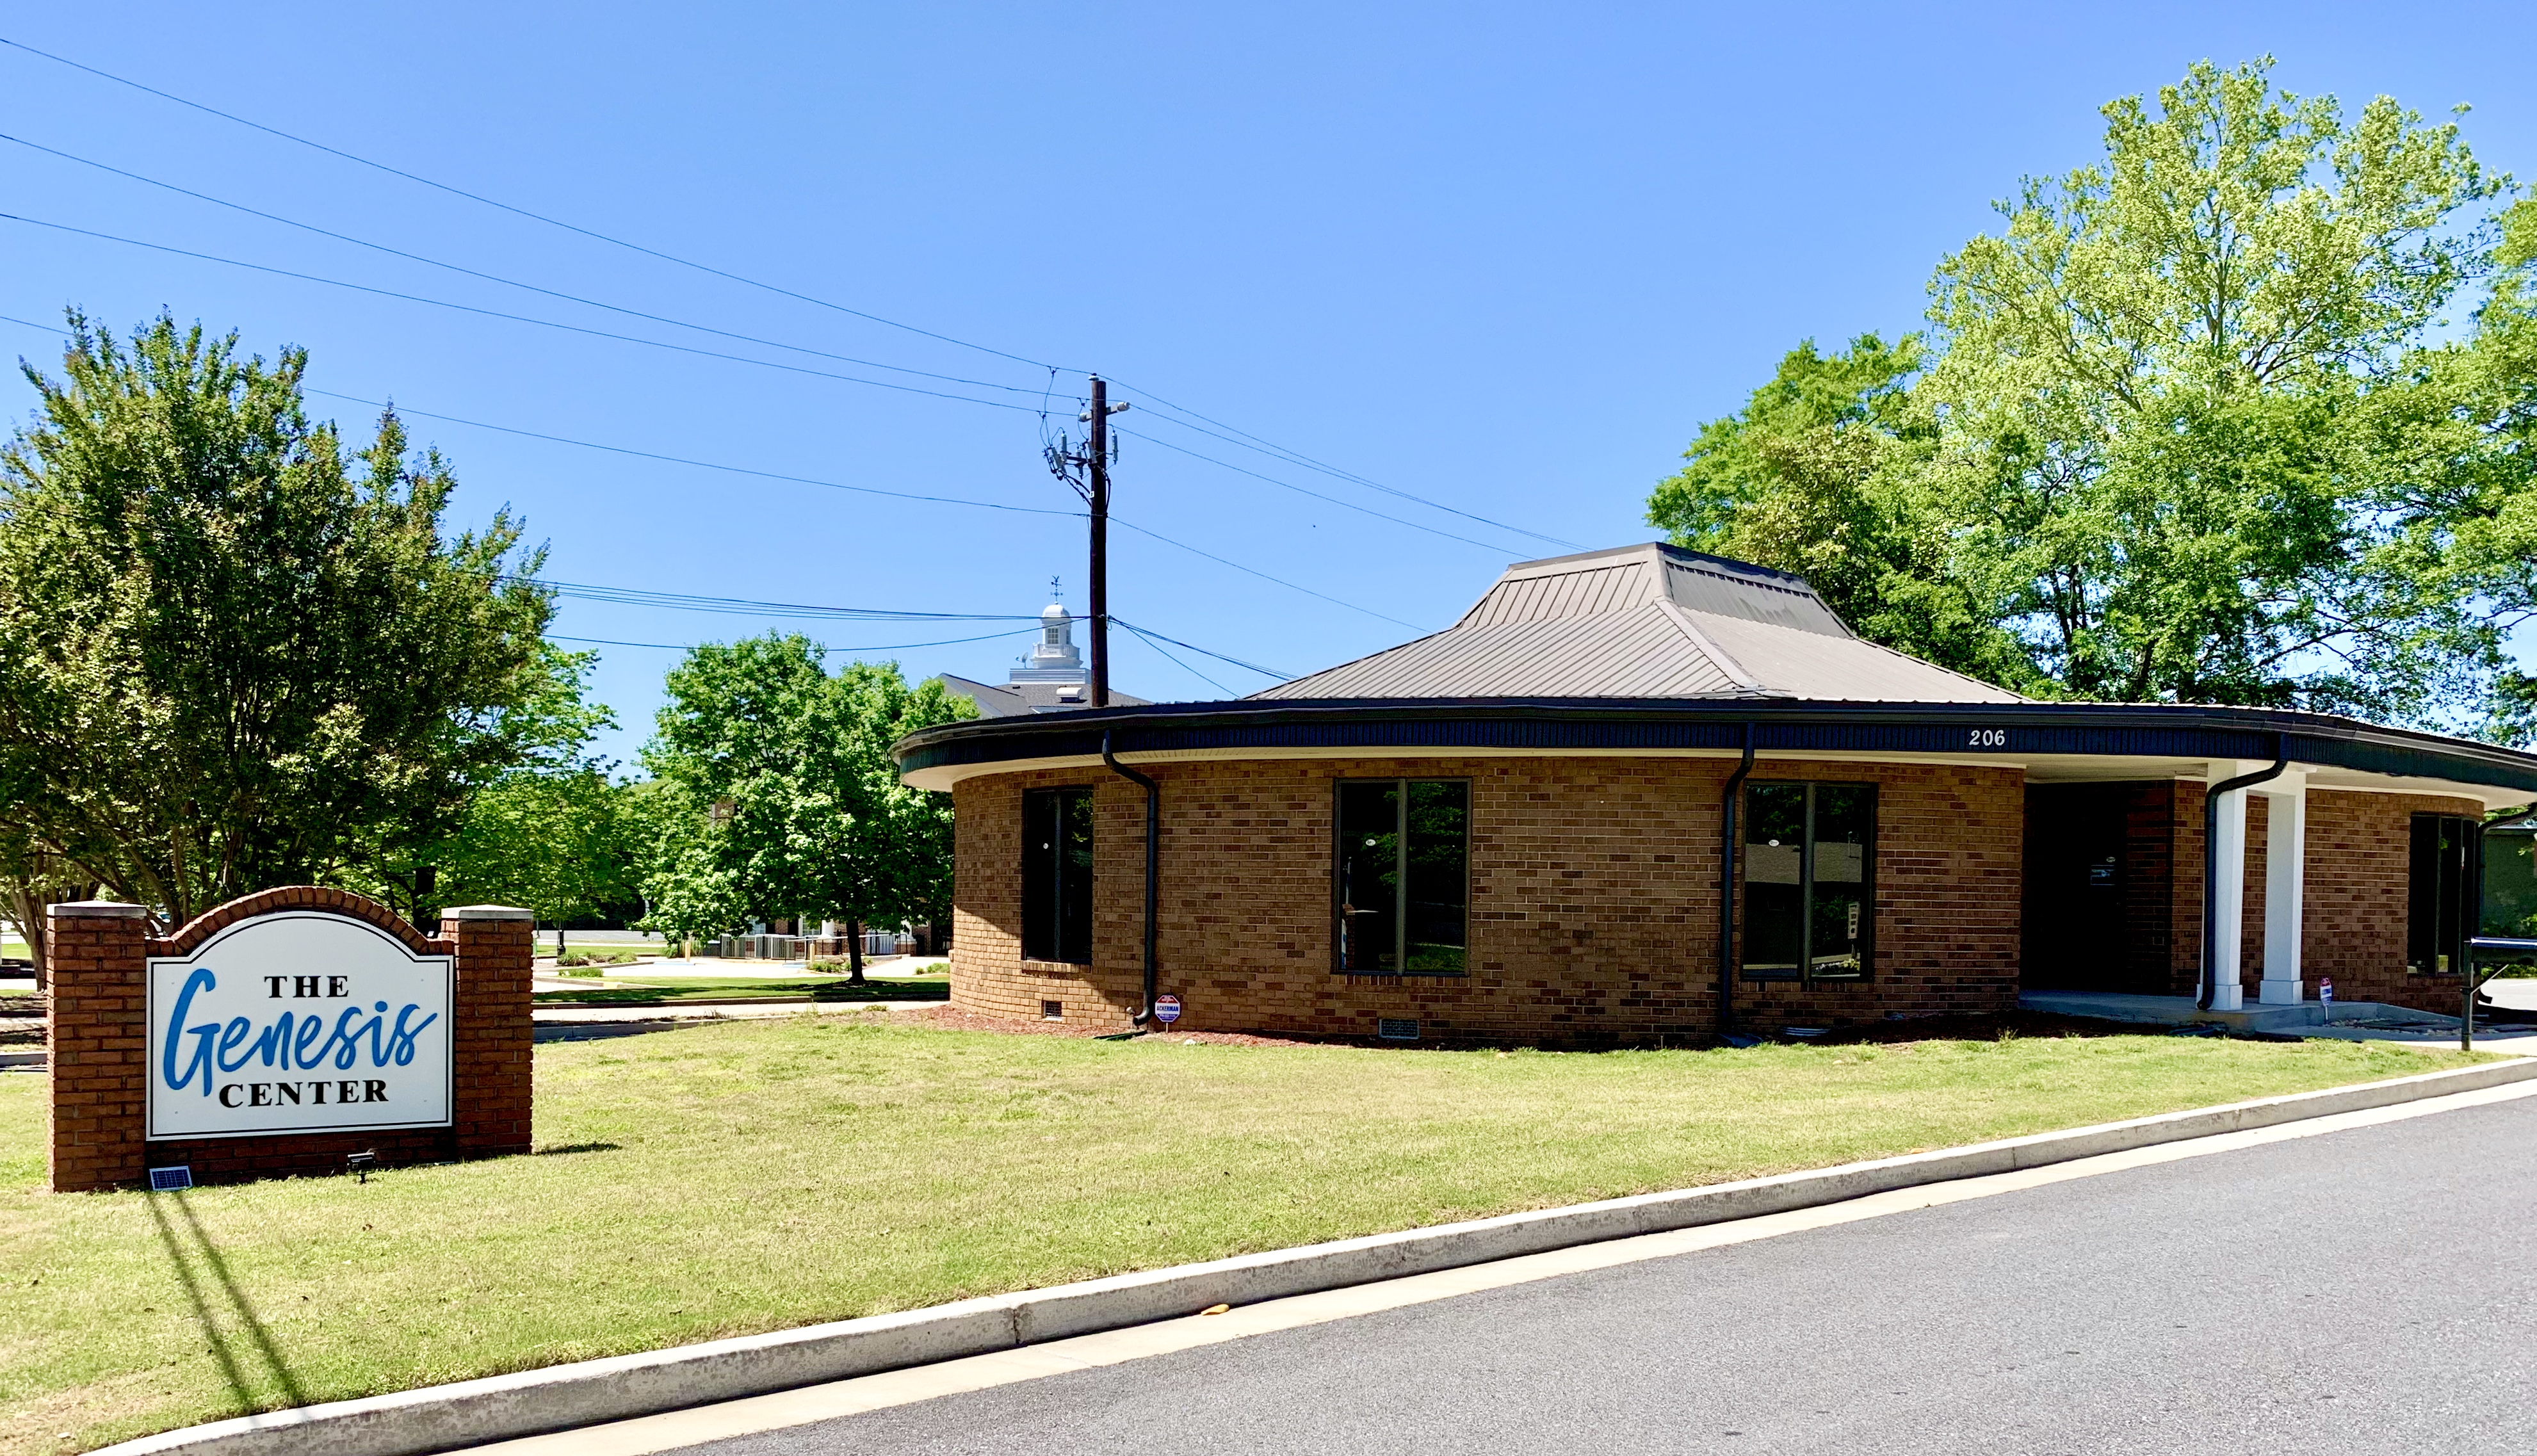 The Genesis Center